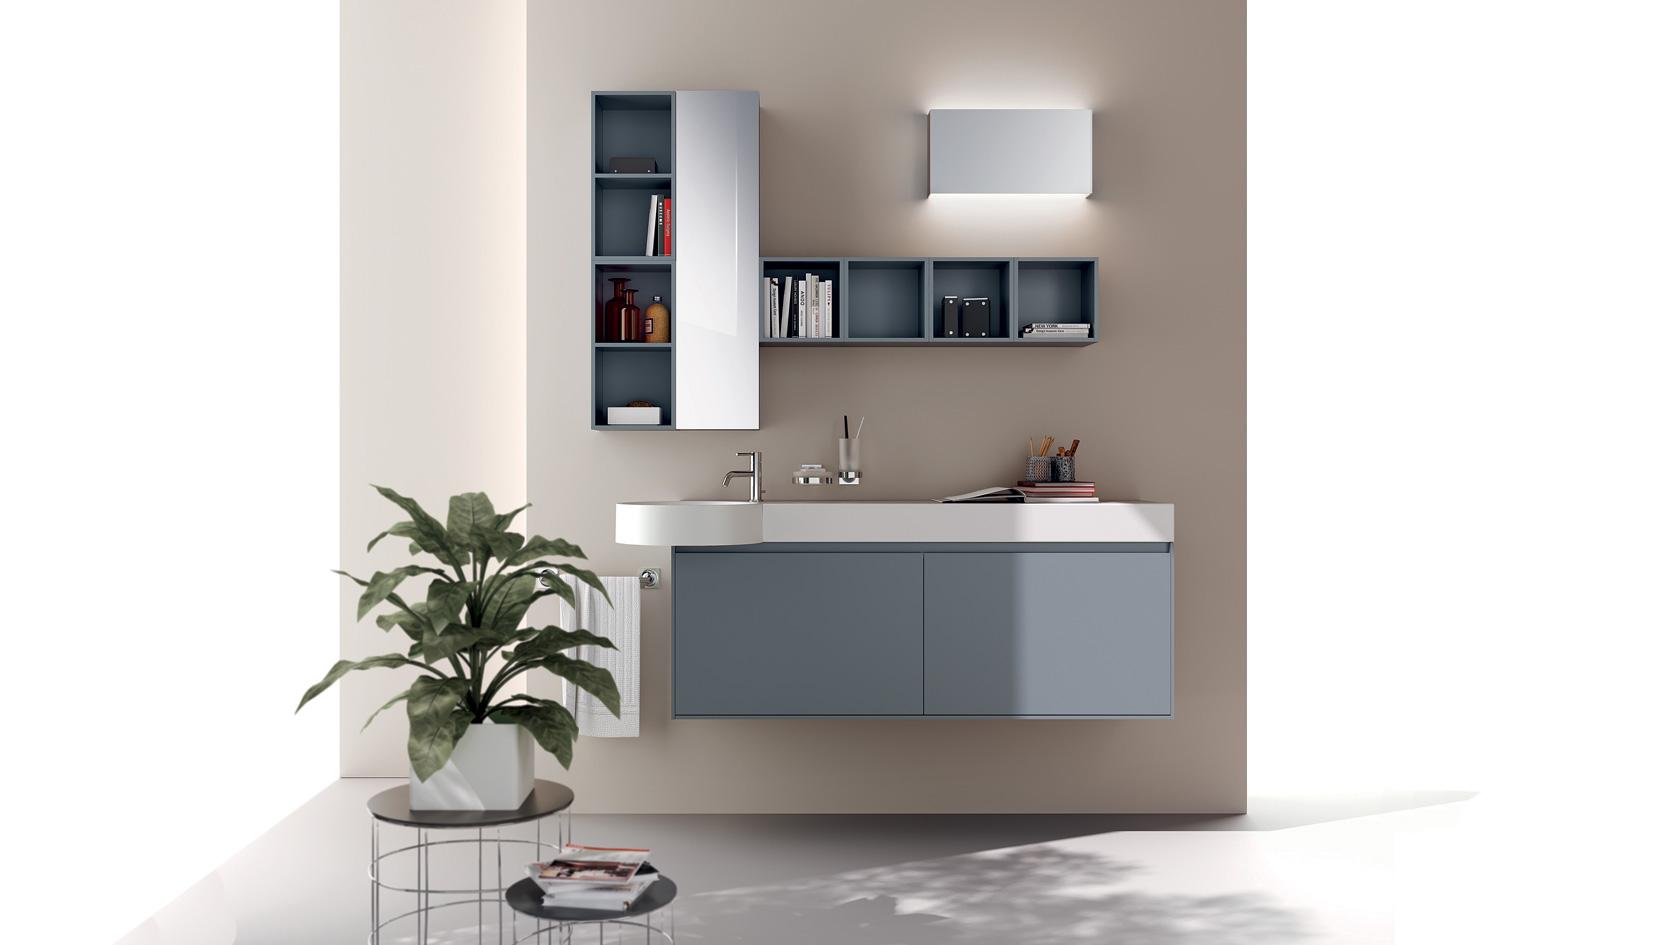 Arredo Bagno Blu Scavolini : Bagni blu scavoli ad oristano piroddi arredamenti dal